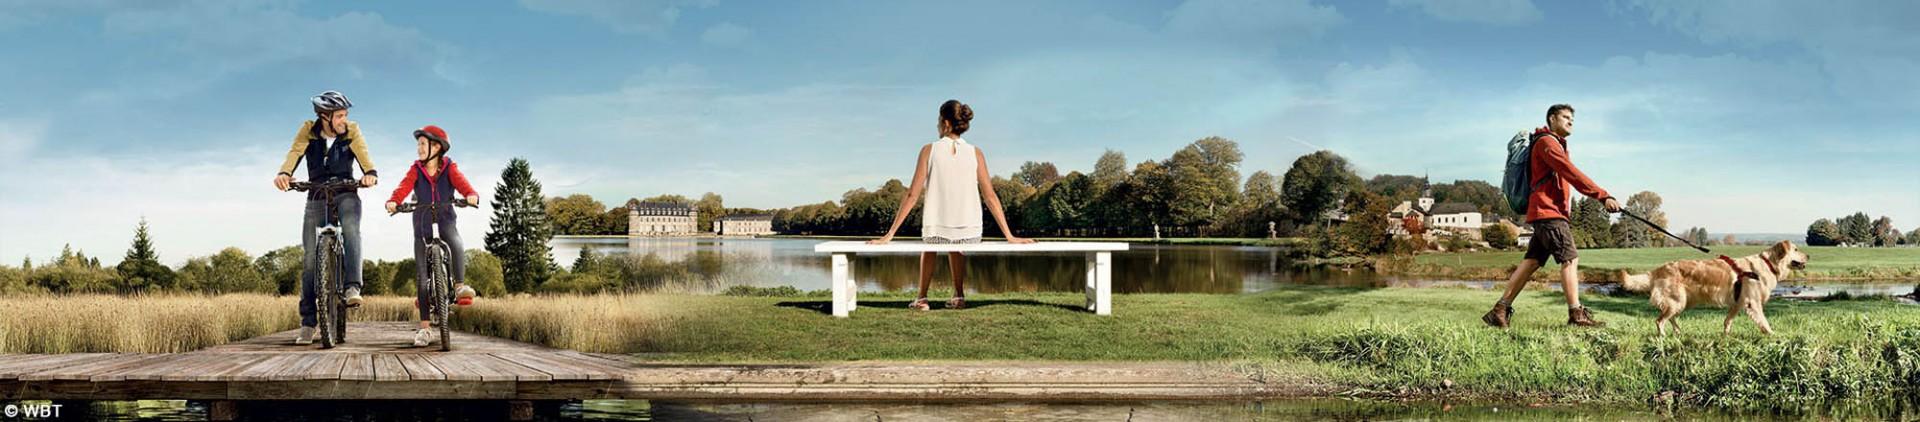 Wallonië Waterland 2019 - Agenda